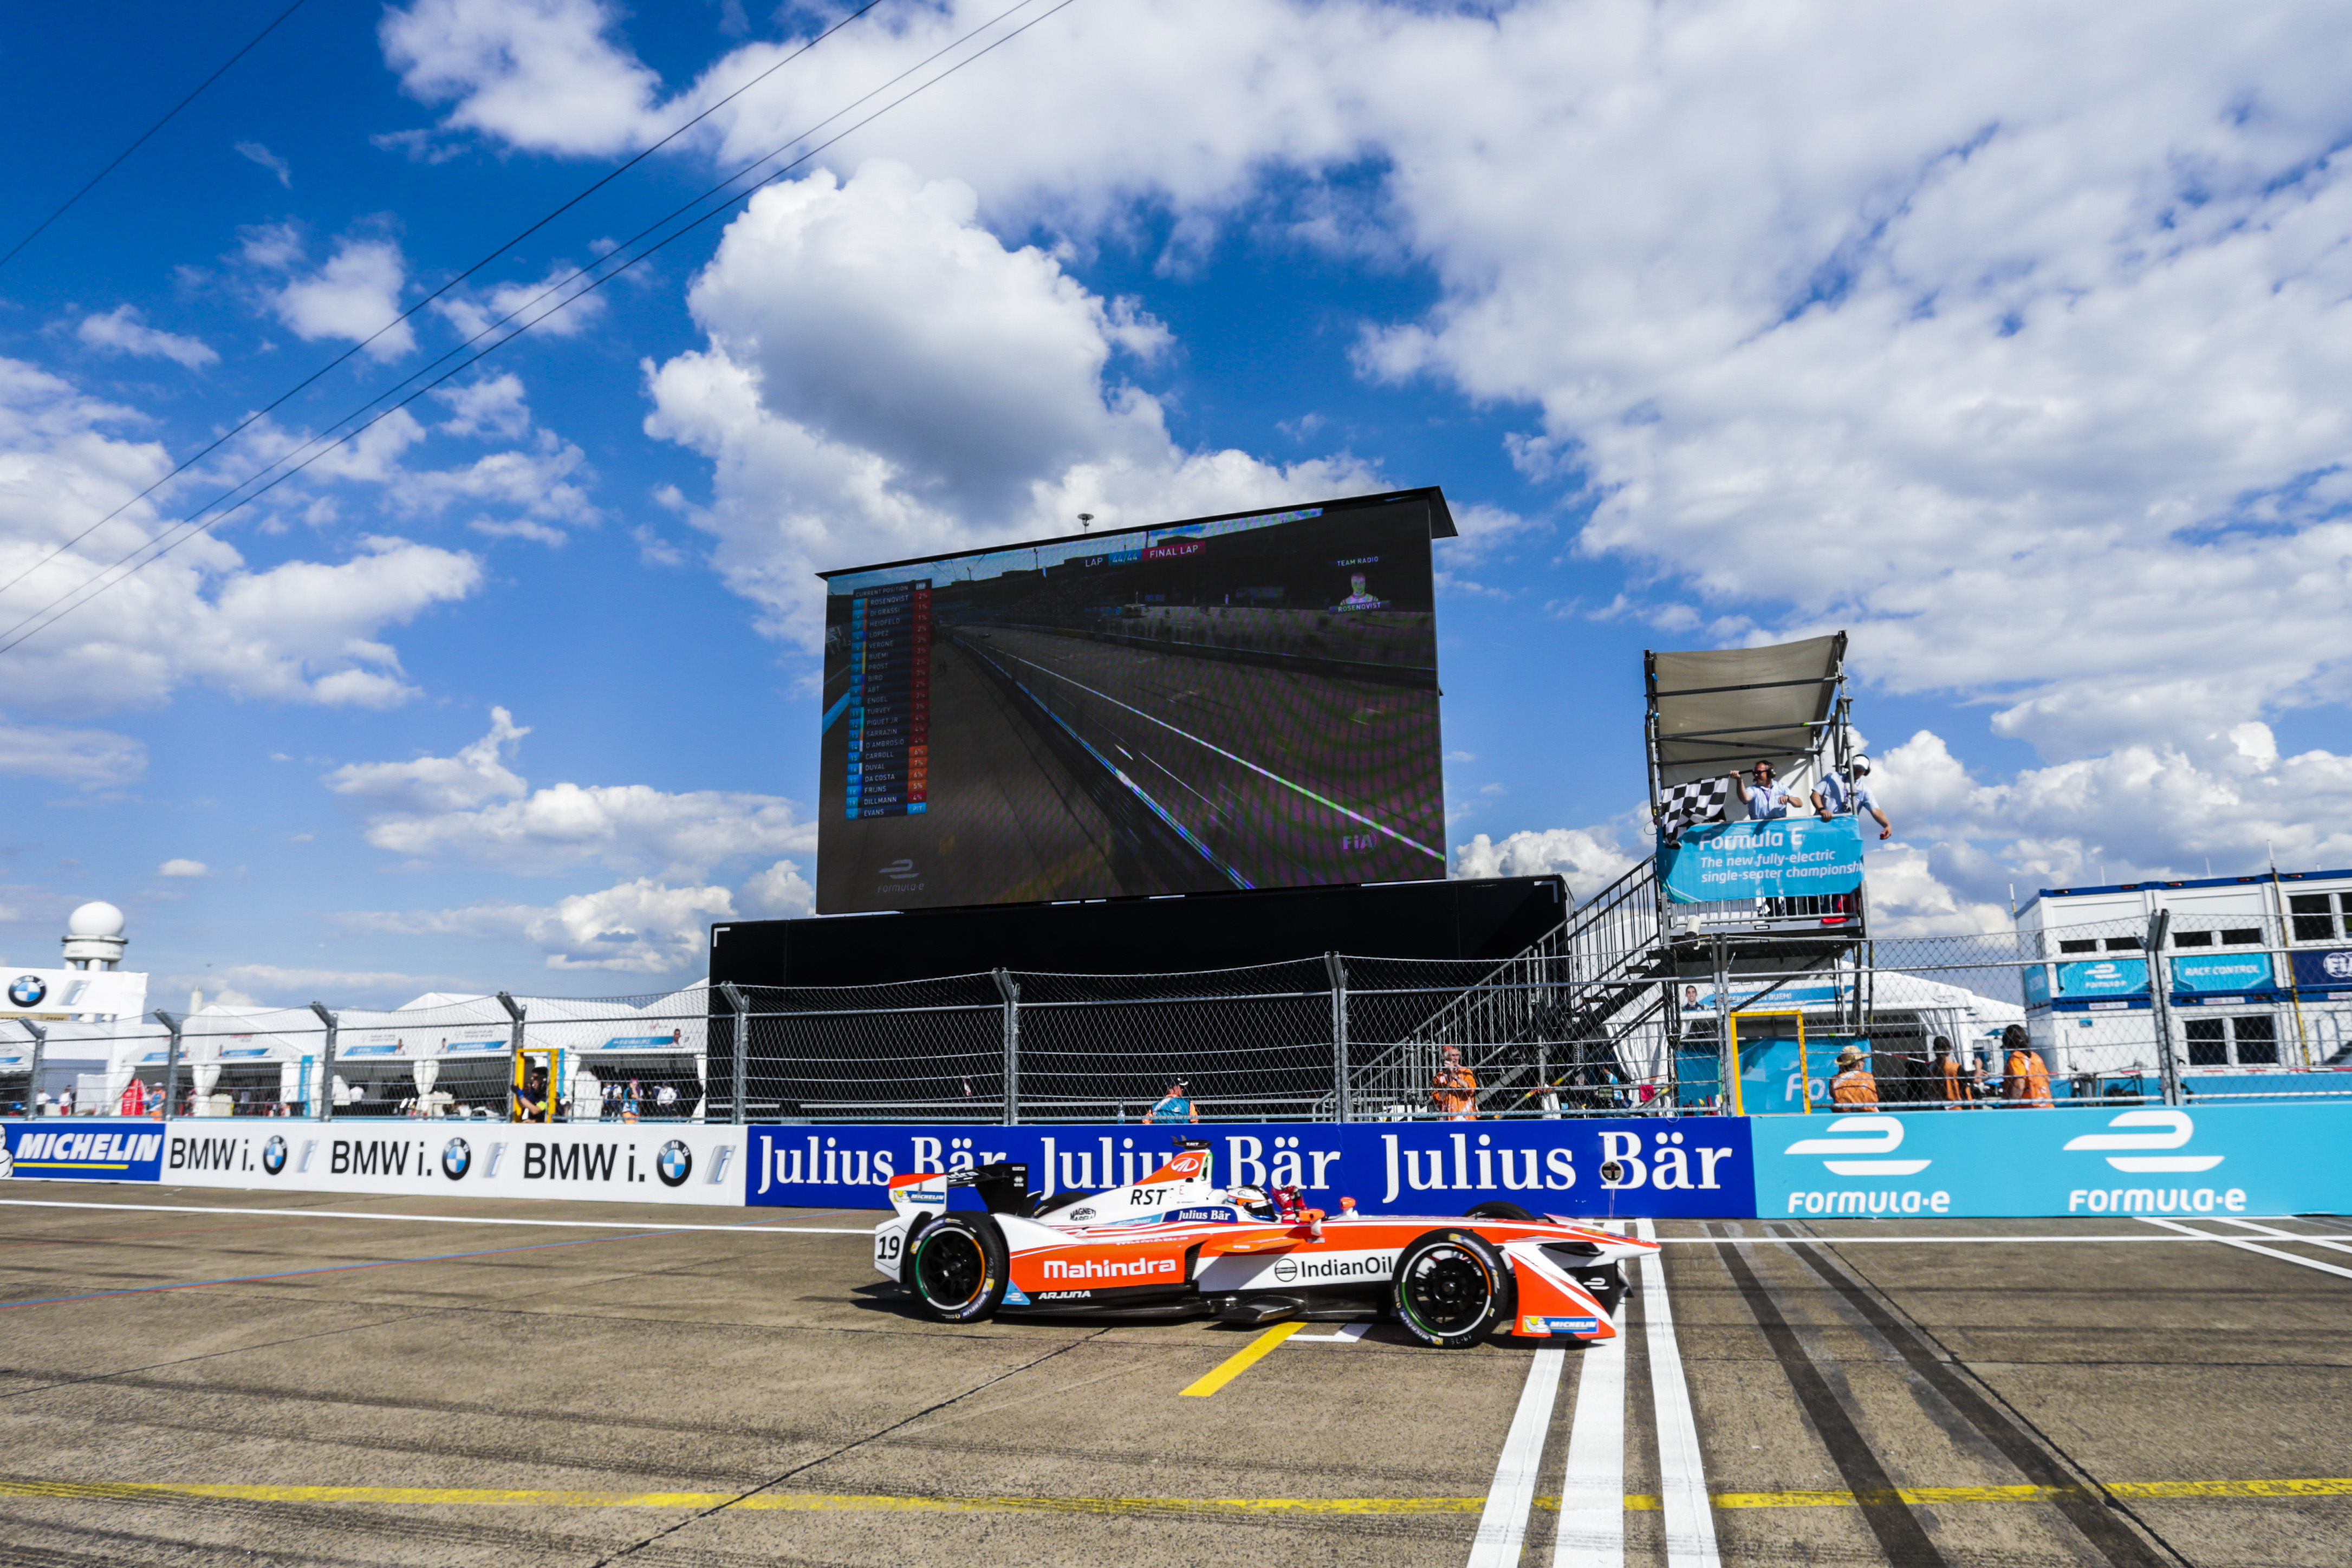 Berlin ePrix Qualifying: Rosenqvist Delivers Pole for Mahindra